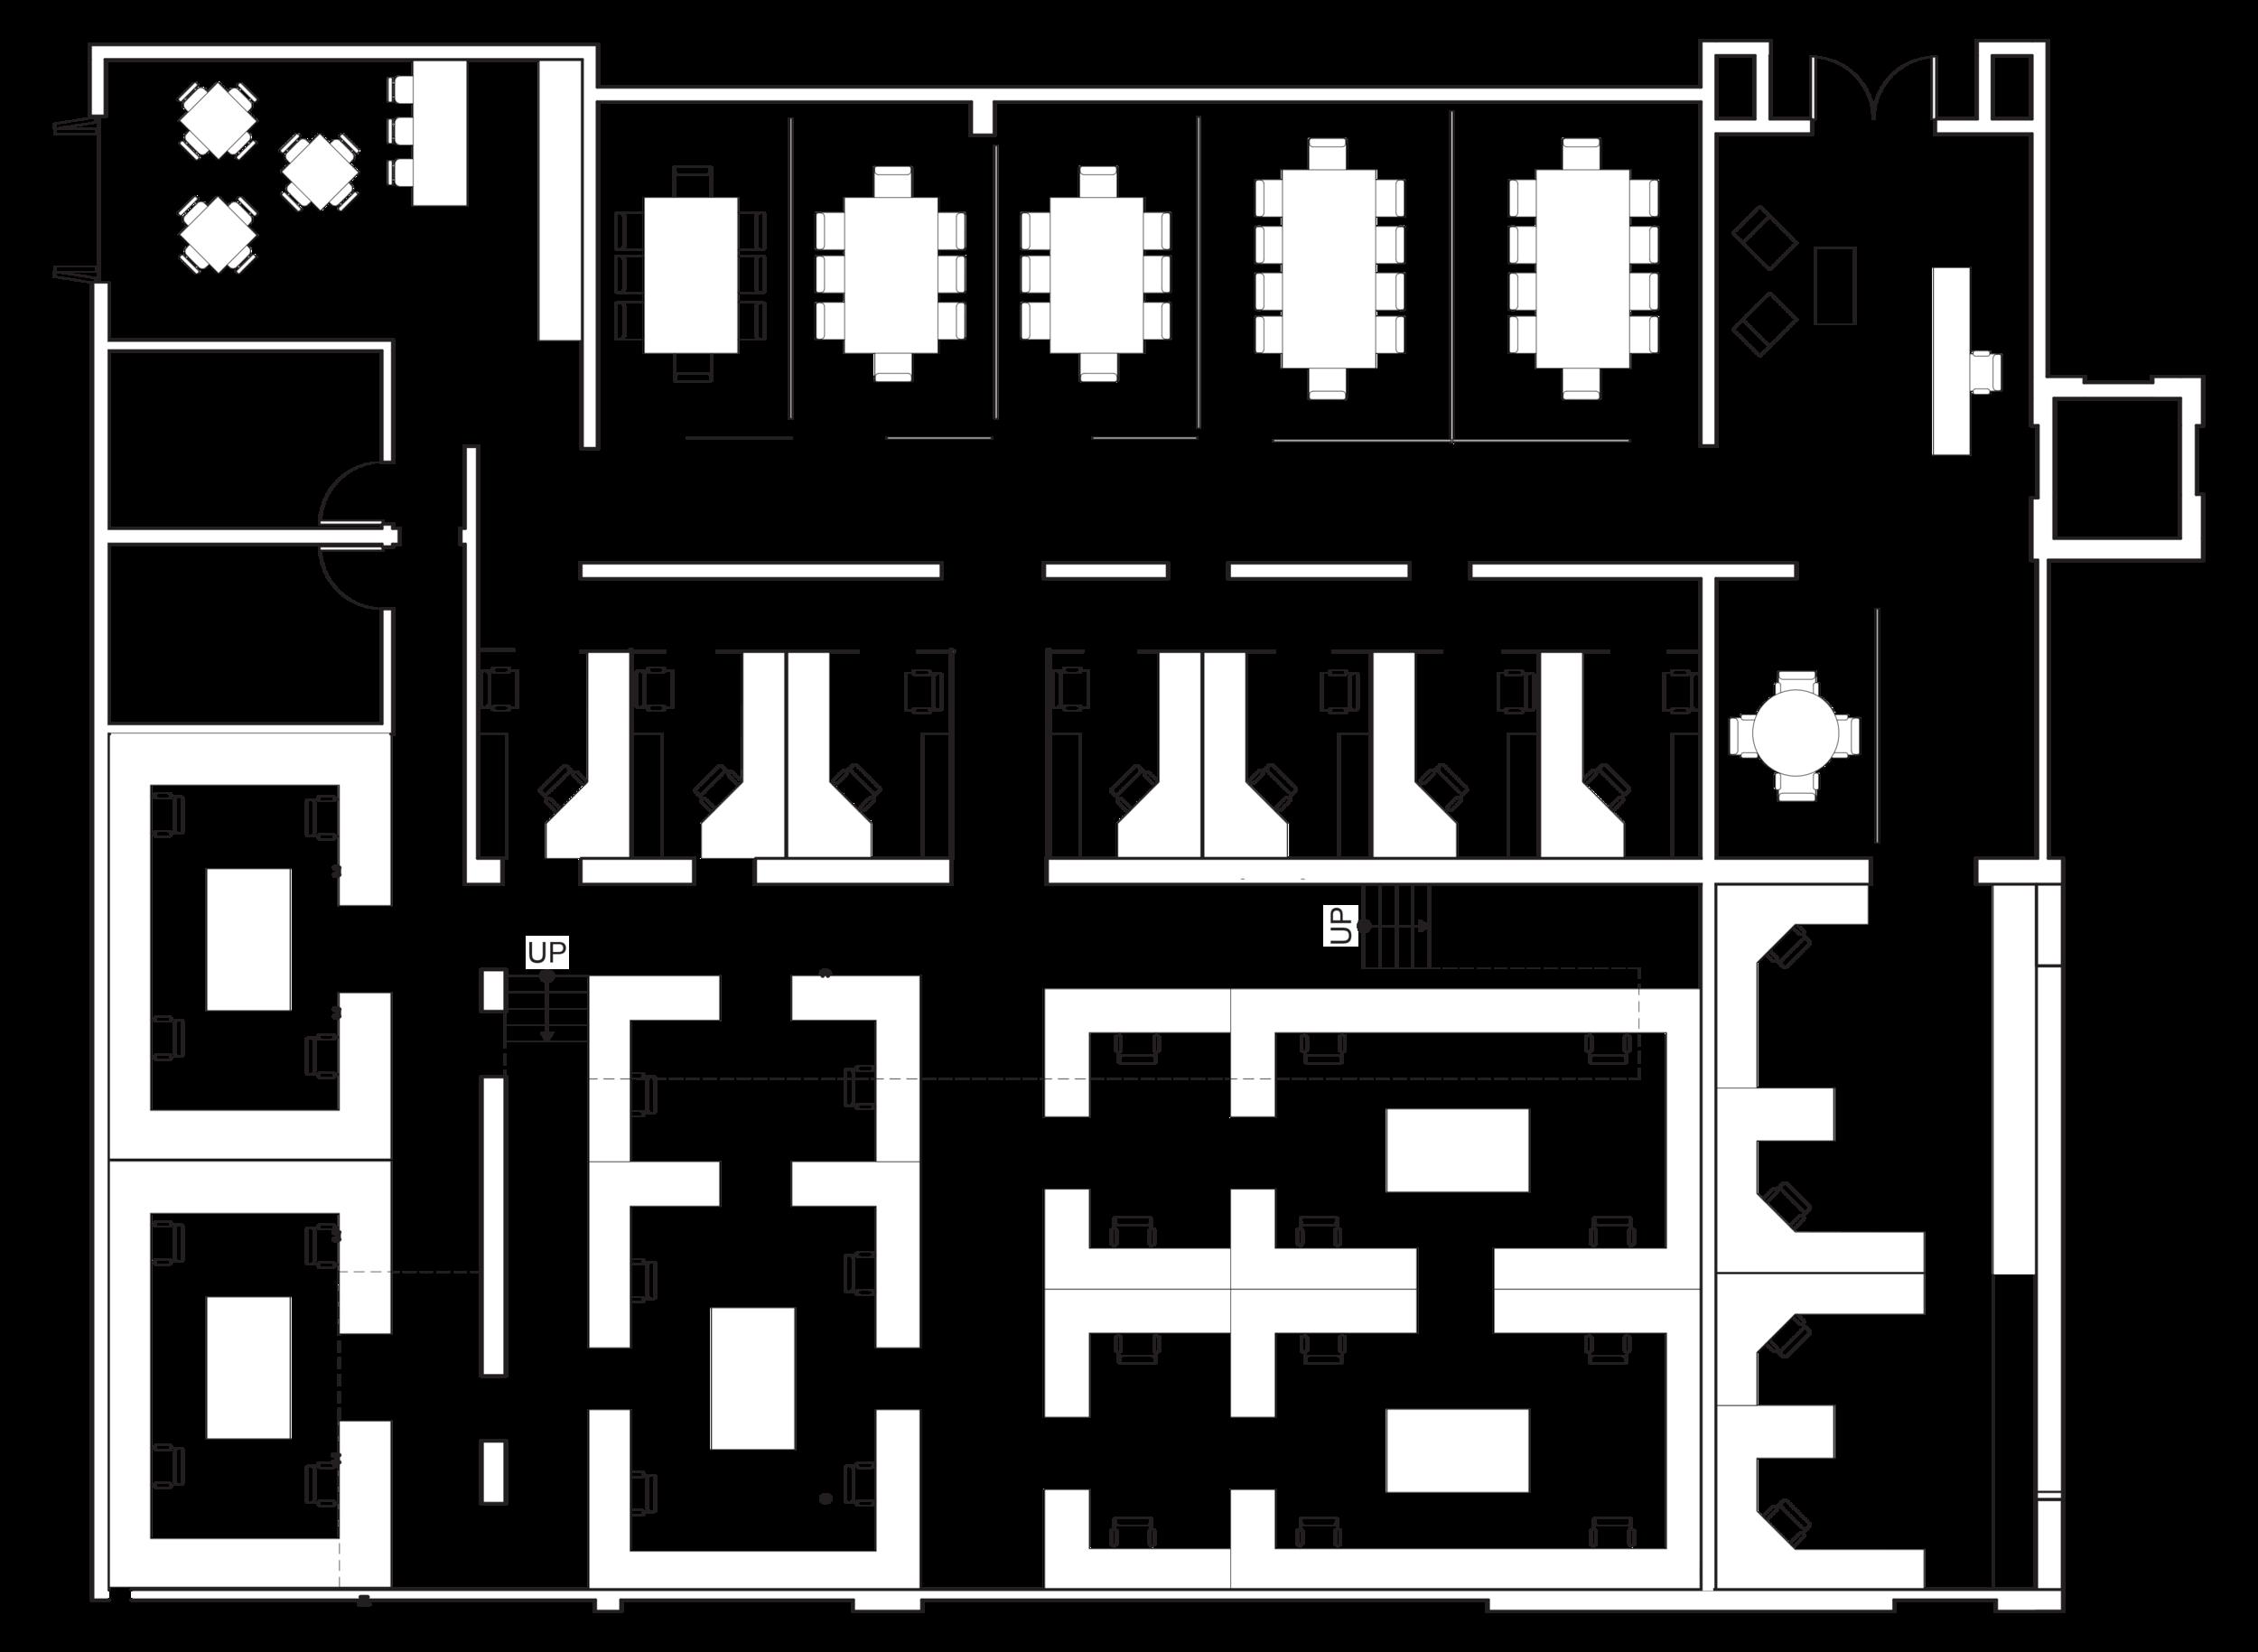 Level 1 - Ground Floor